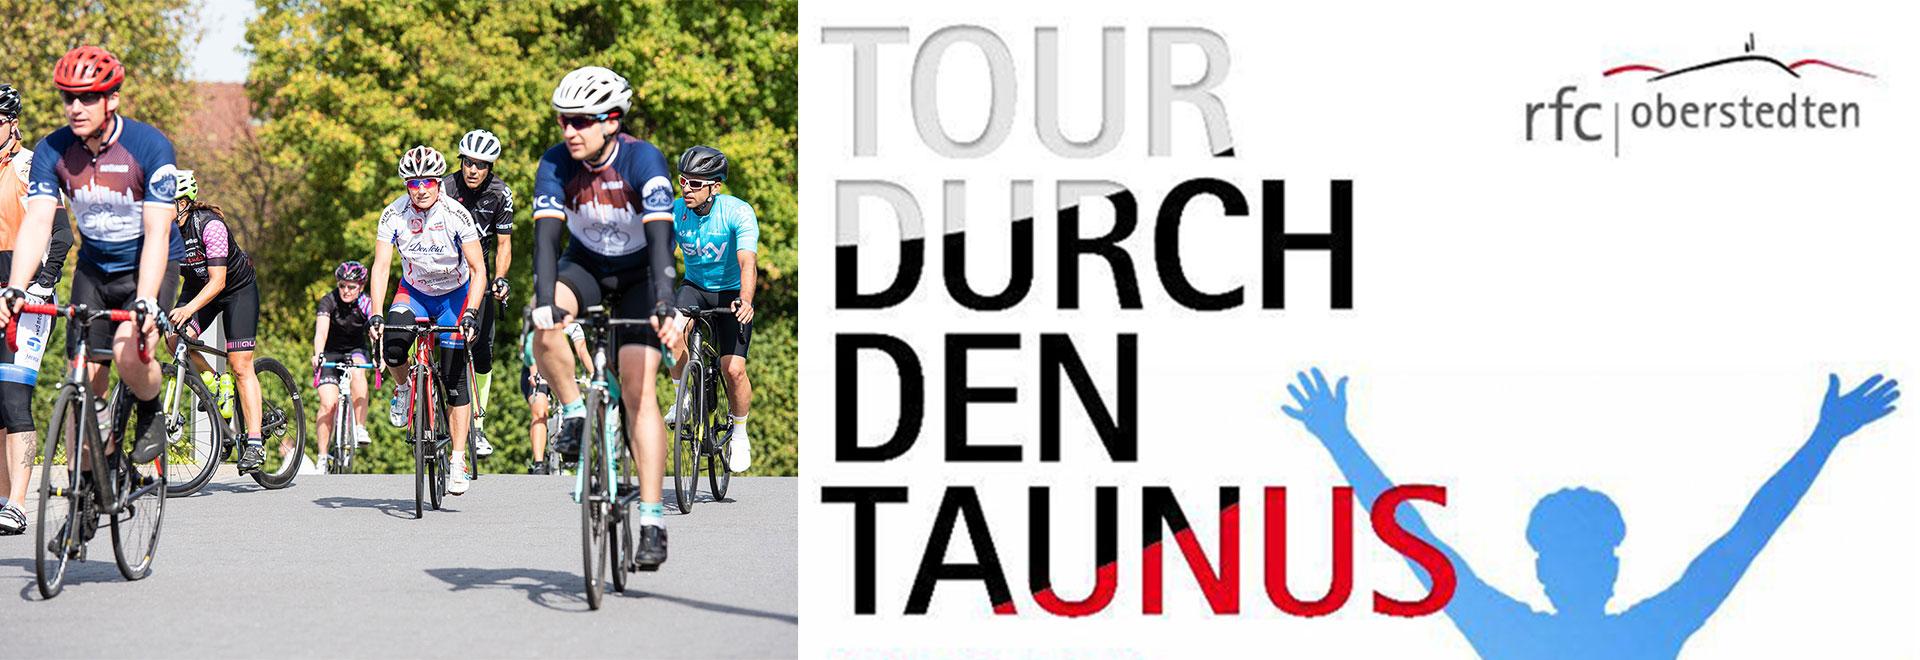 RTF Denfeld Tour durch den Taunus